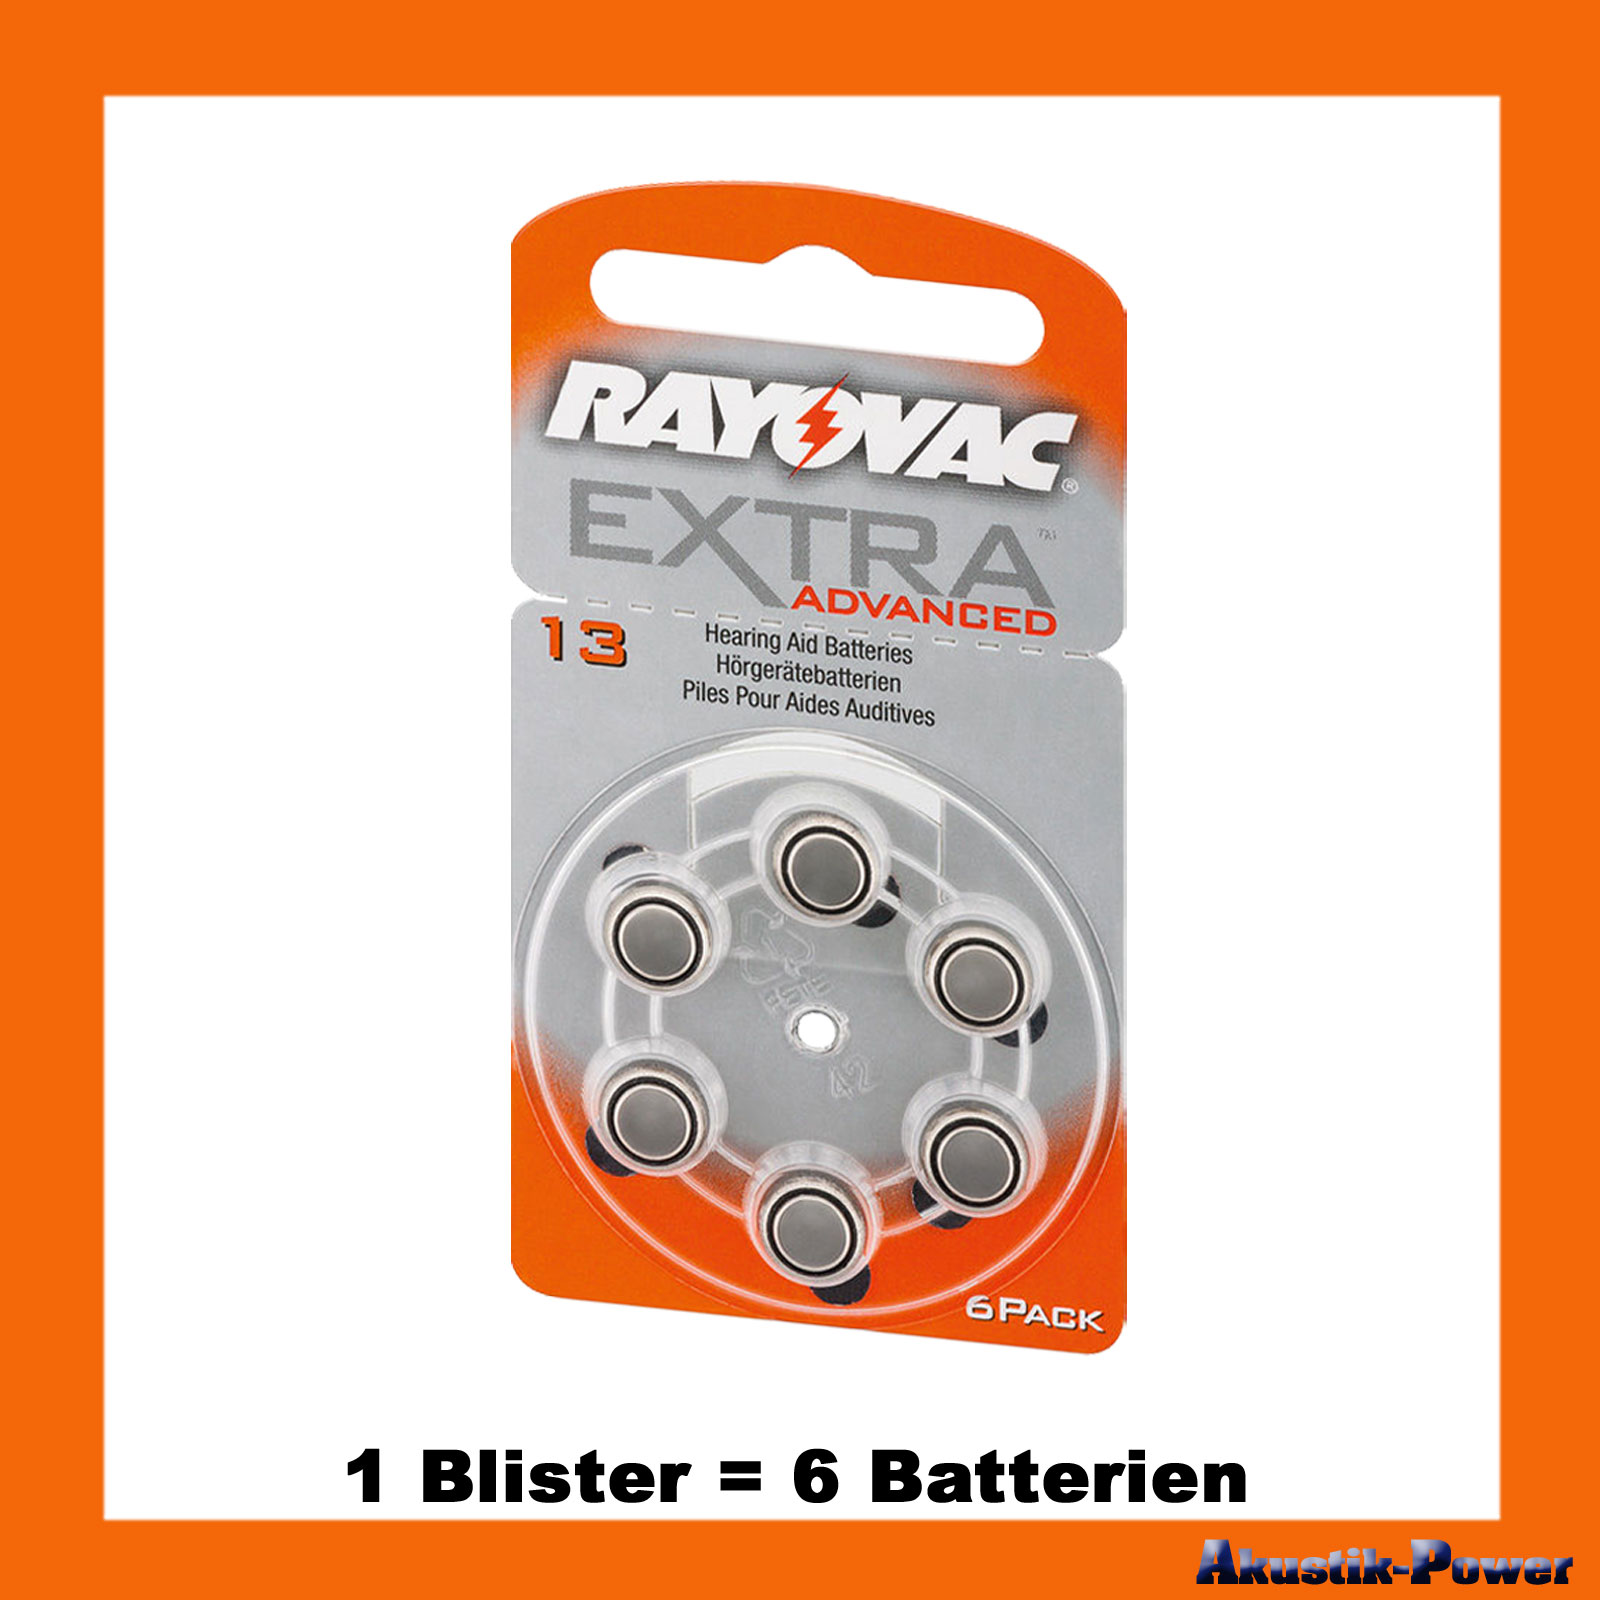 akustik power rayovac typ 13 pr48 h rger te batterien 6 batterien 3 19 online kaufen. Black Bedroom Furniture Sets. Home Design Ideas